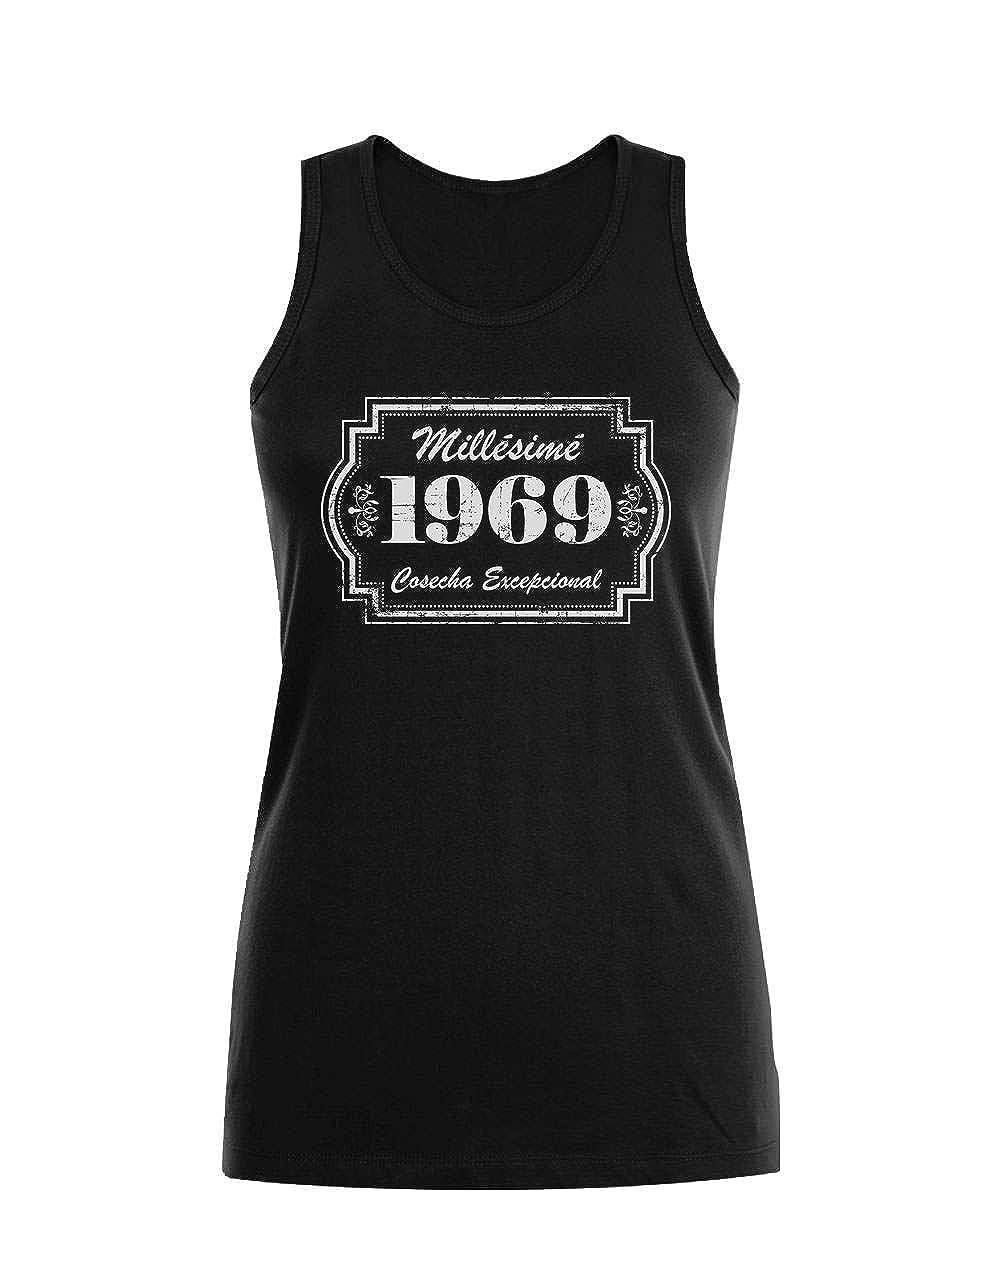 Camiseta sin Mangas para Mujer - 1969 Cosecha Excepcional ...